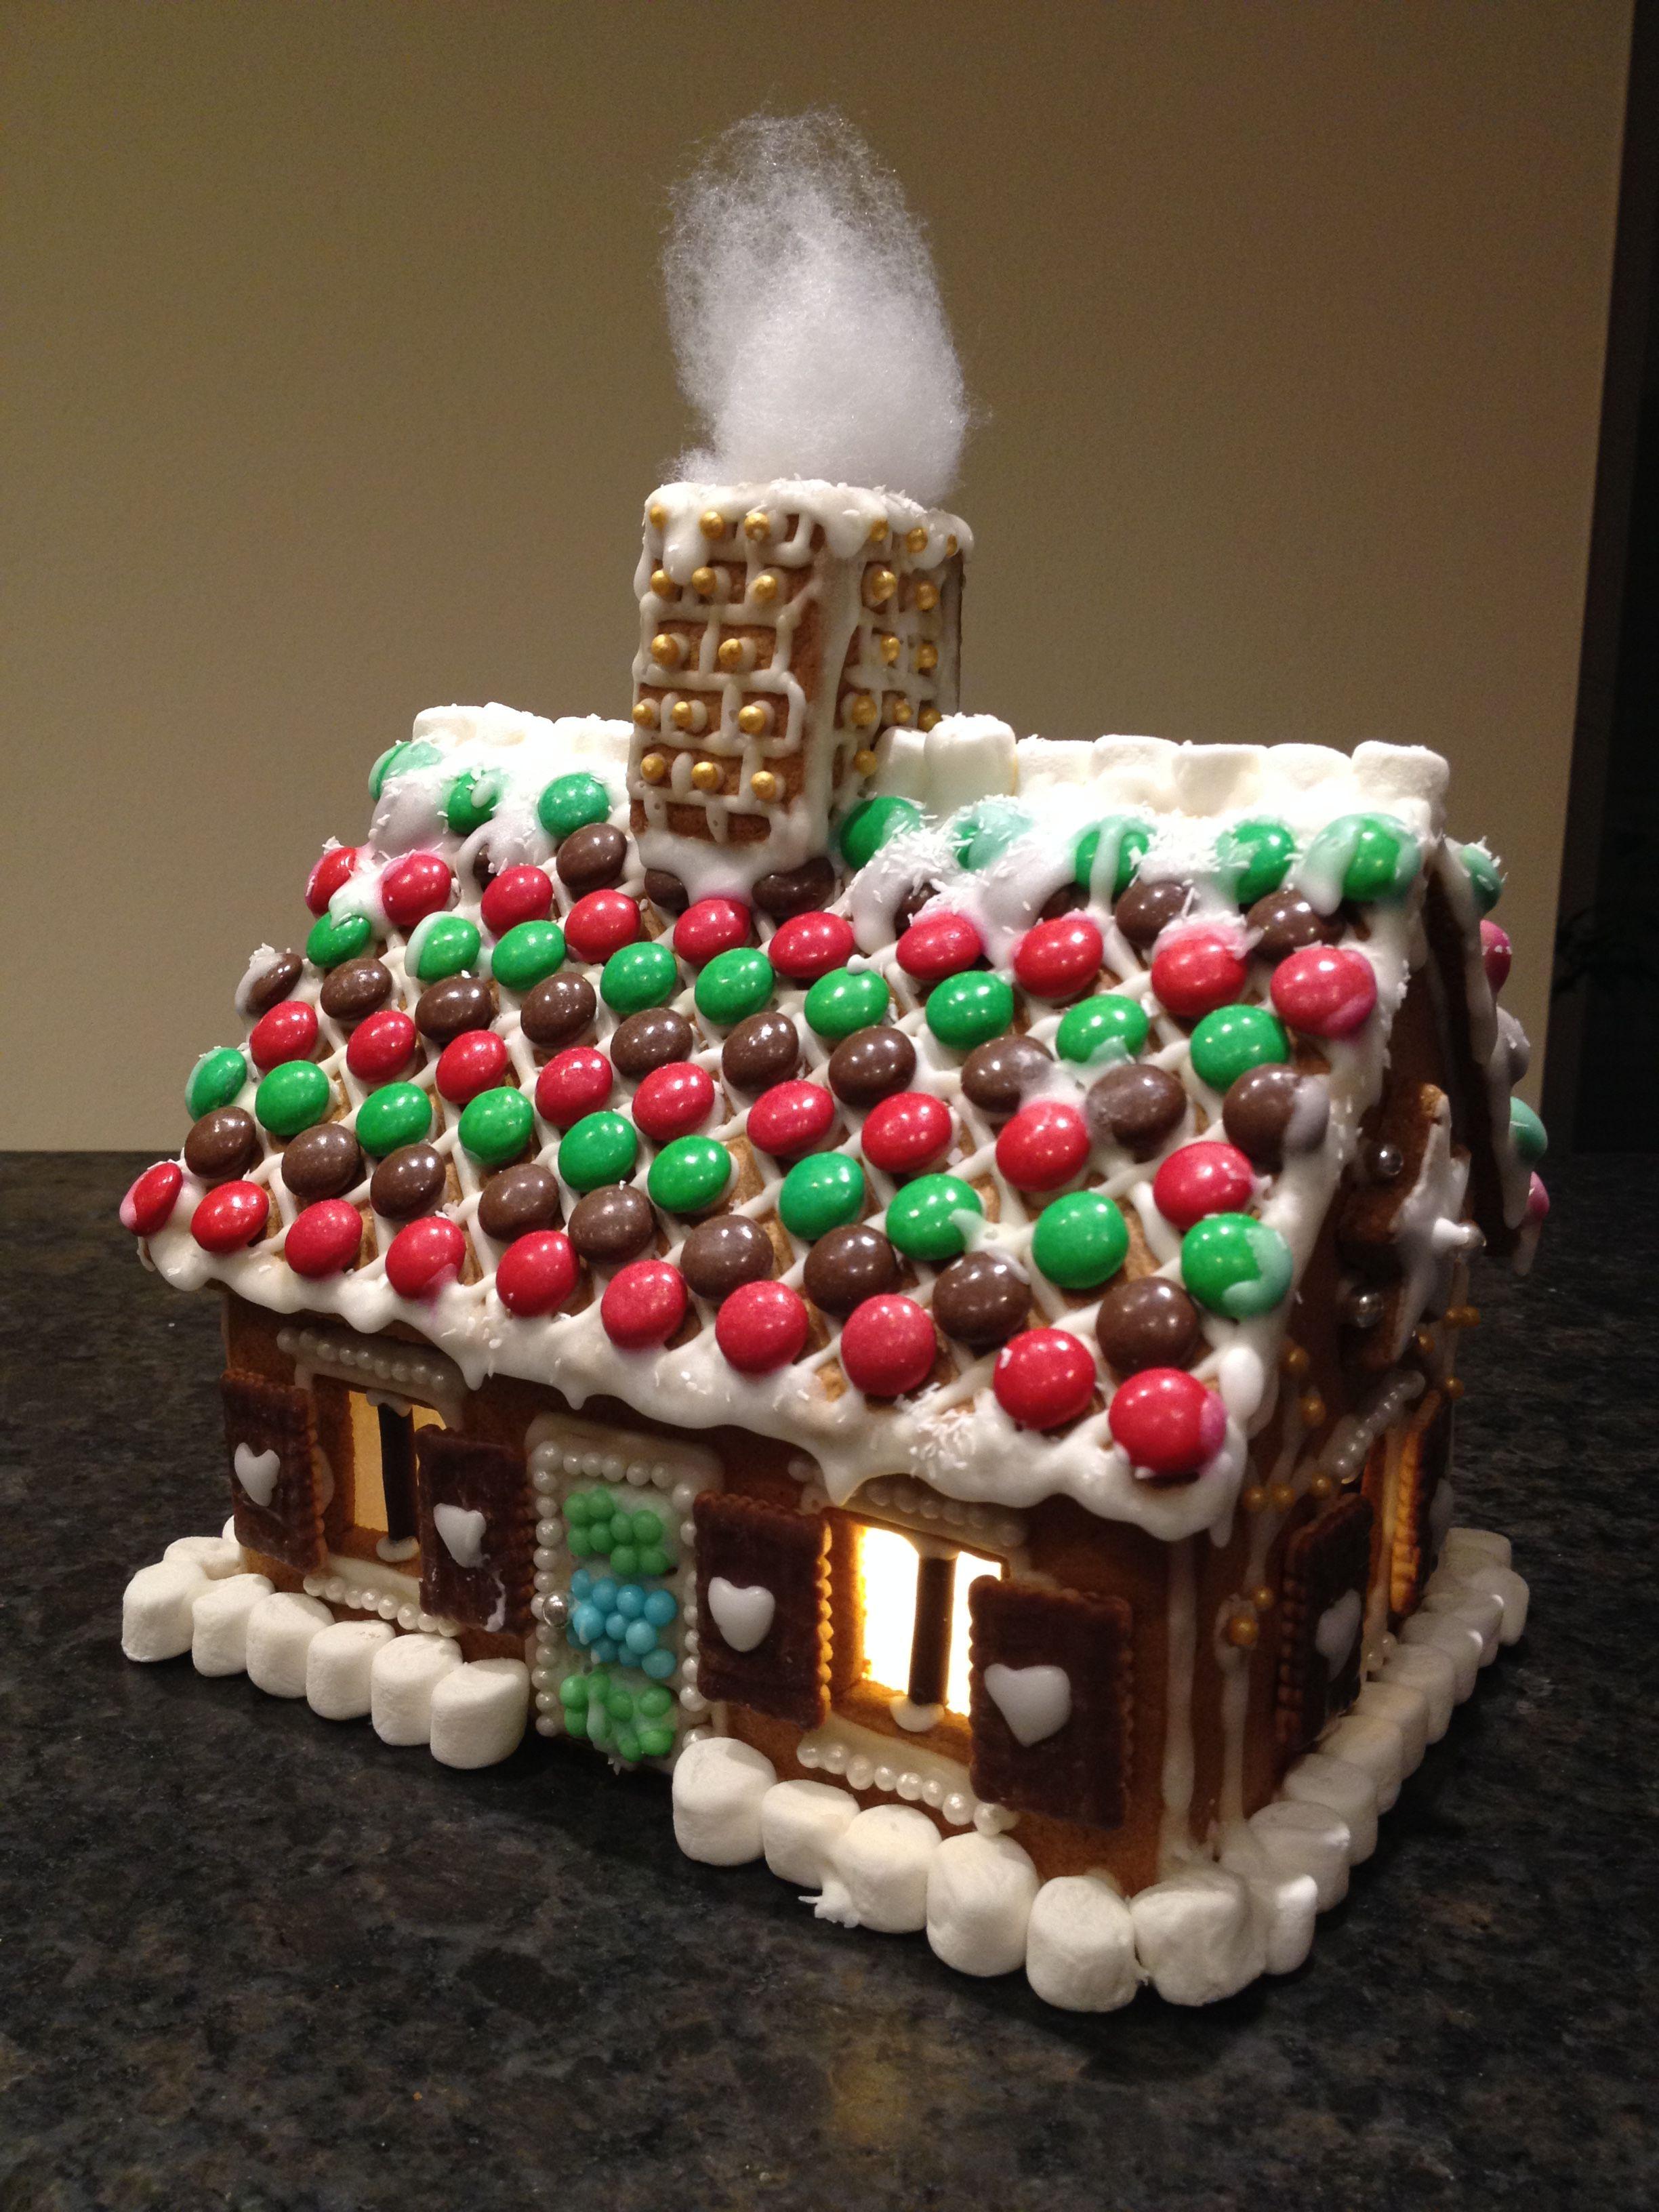 Ikea Lebkuchenhaus Gingerbread House Decorations Christmas Gingerbread Christmas Gingerbread House